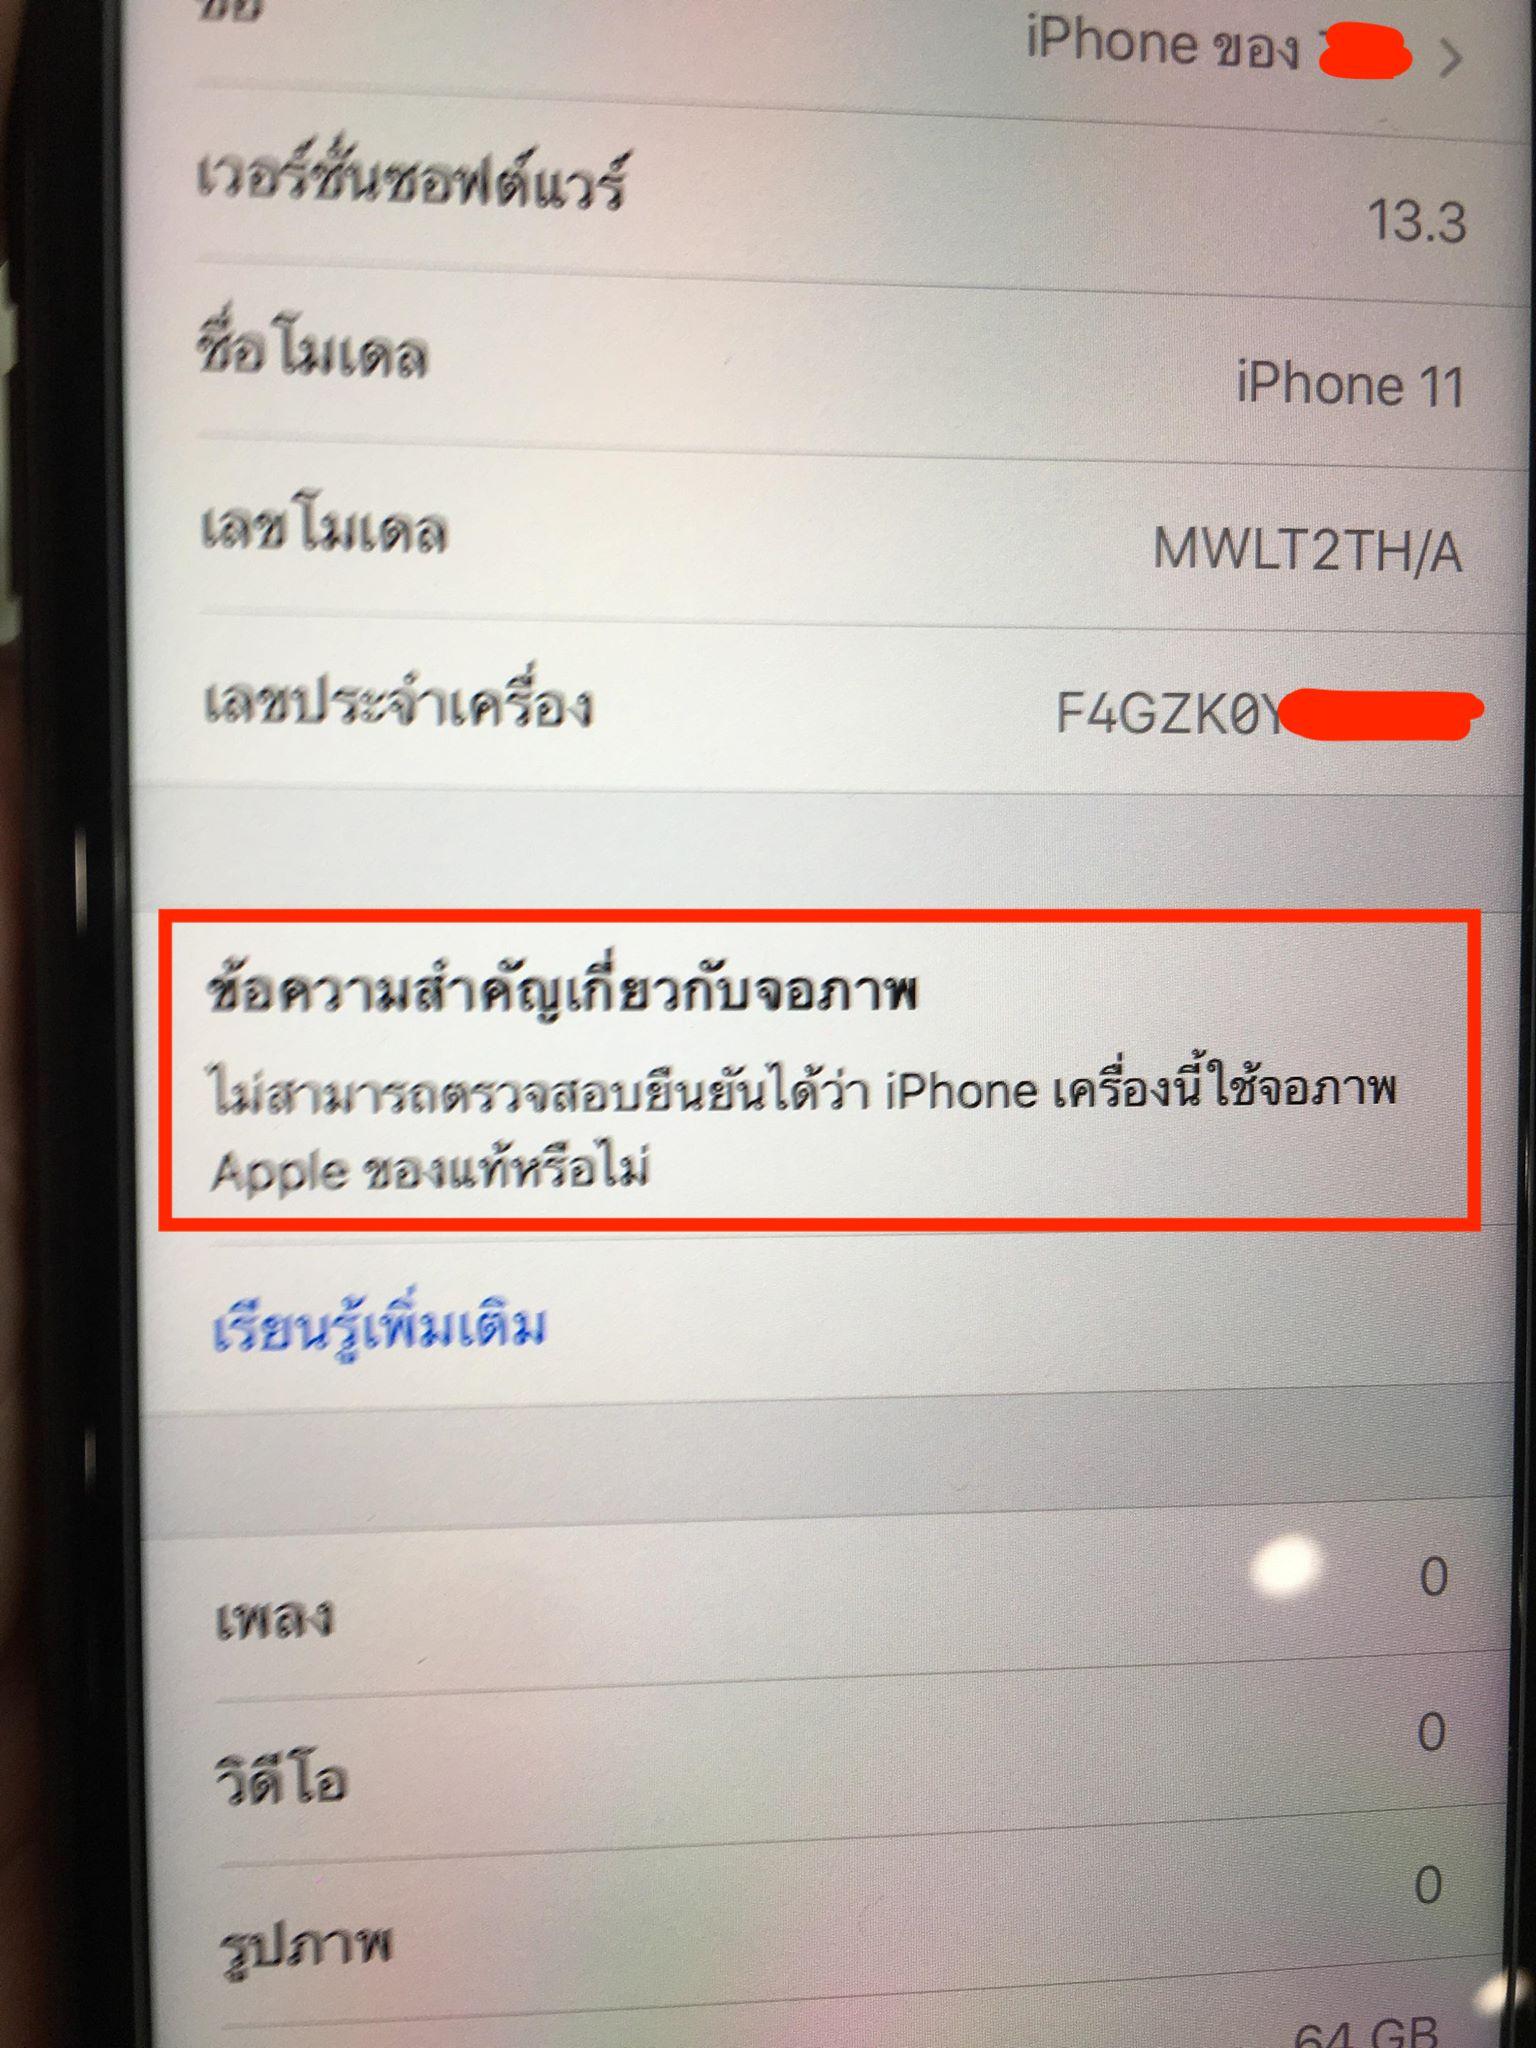 Iphone 11 เปลี่ยหน้าจอใหม่